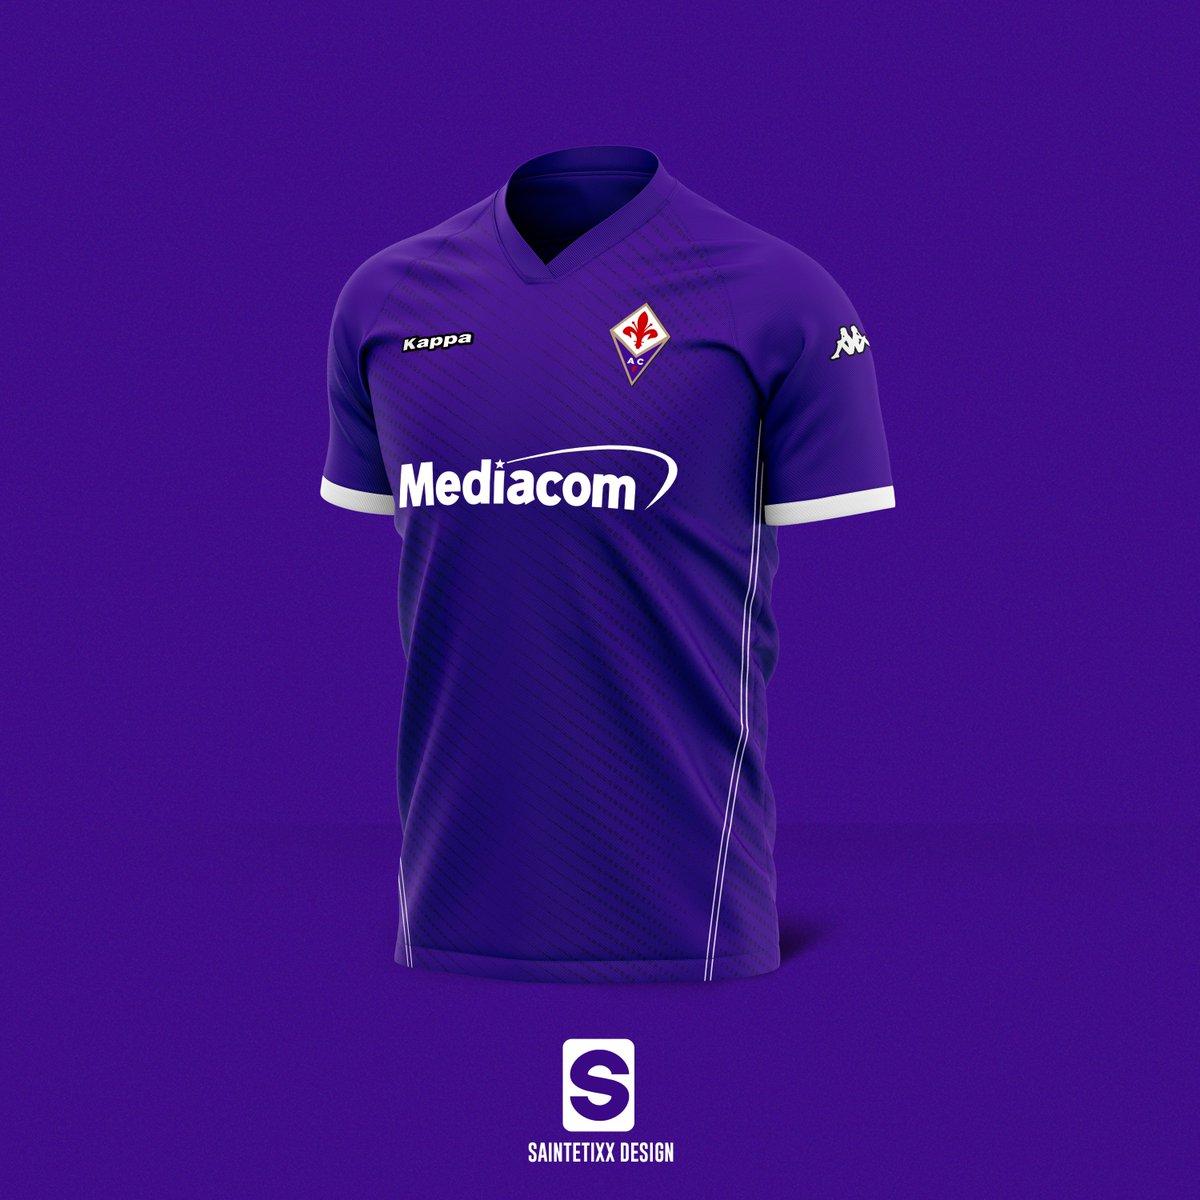 Acf Fiorentina Hashtag On Twitter